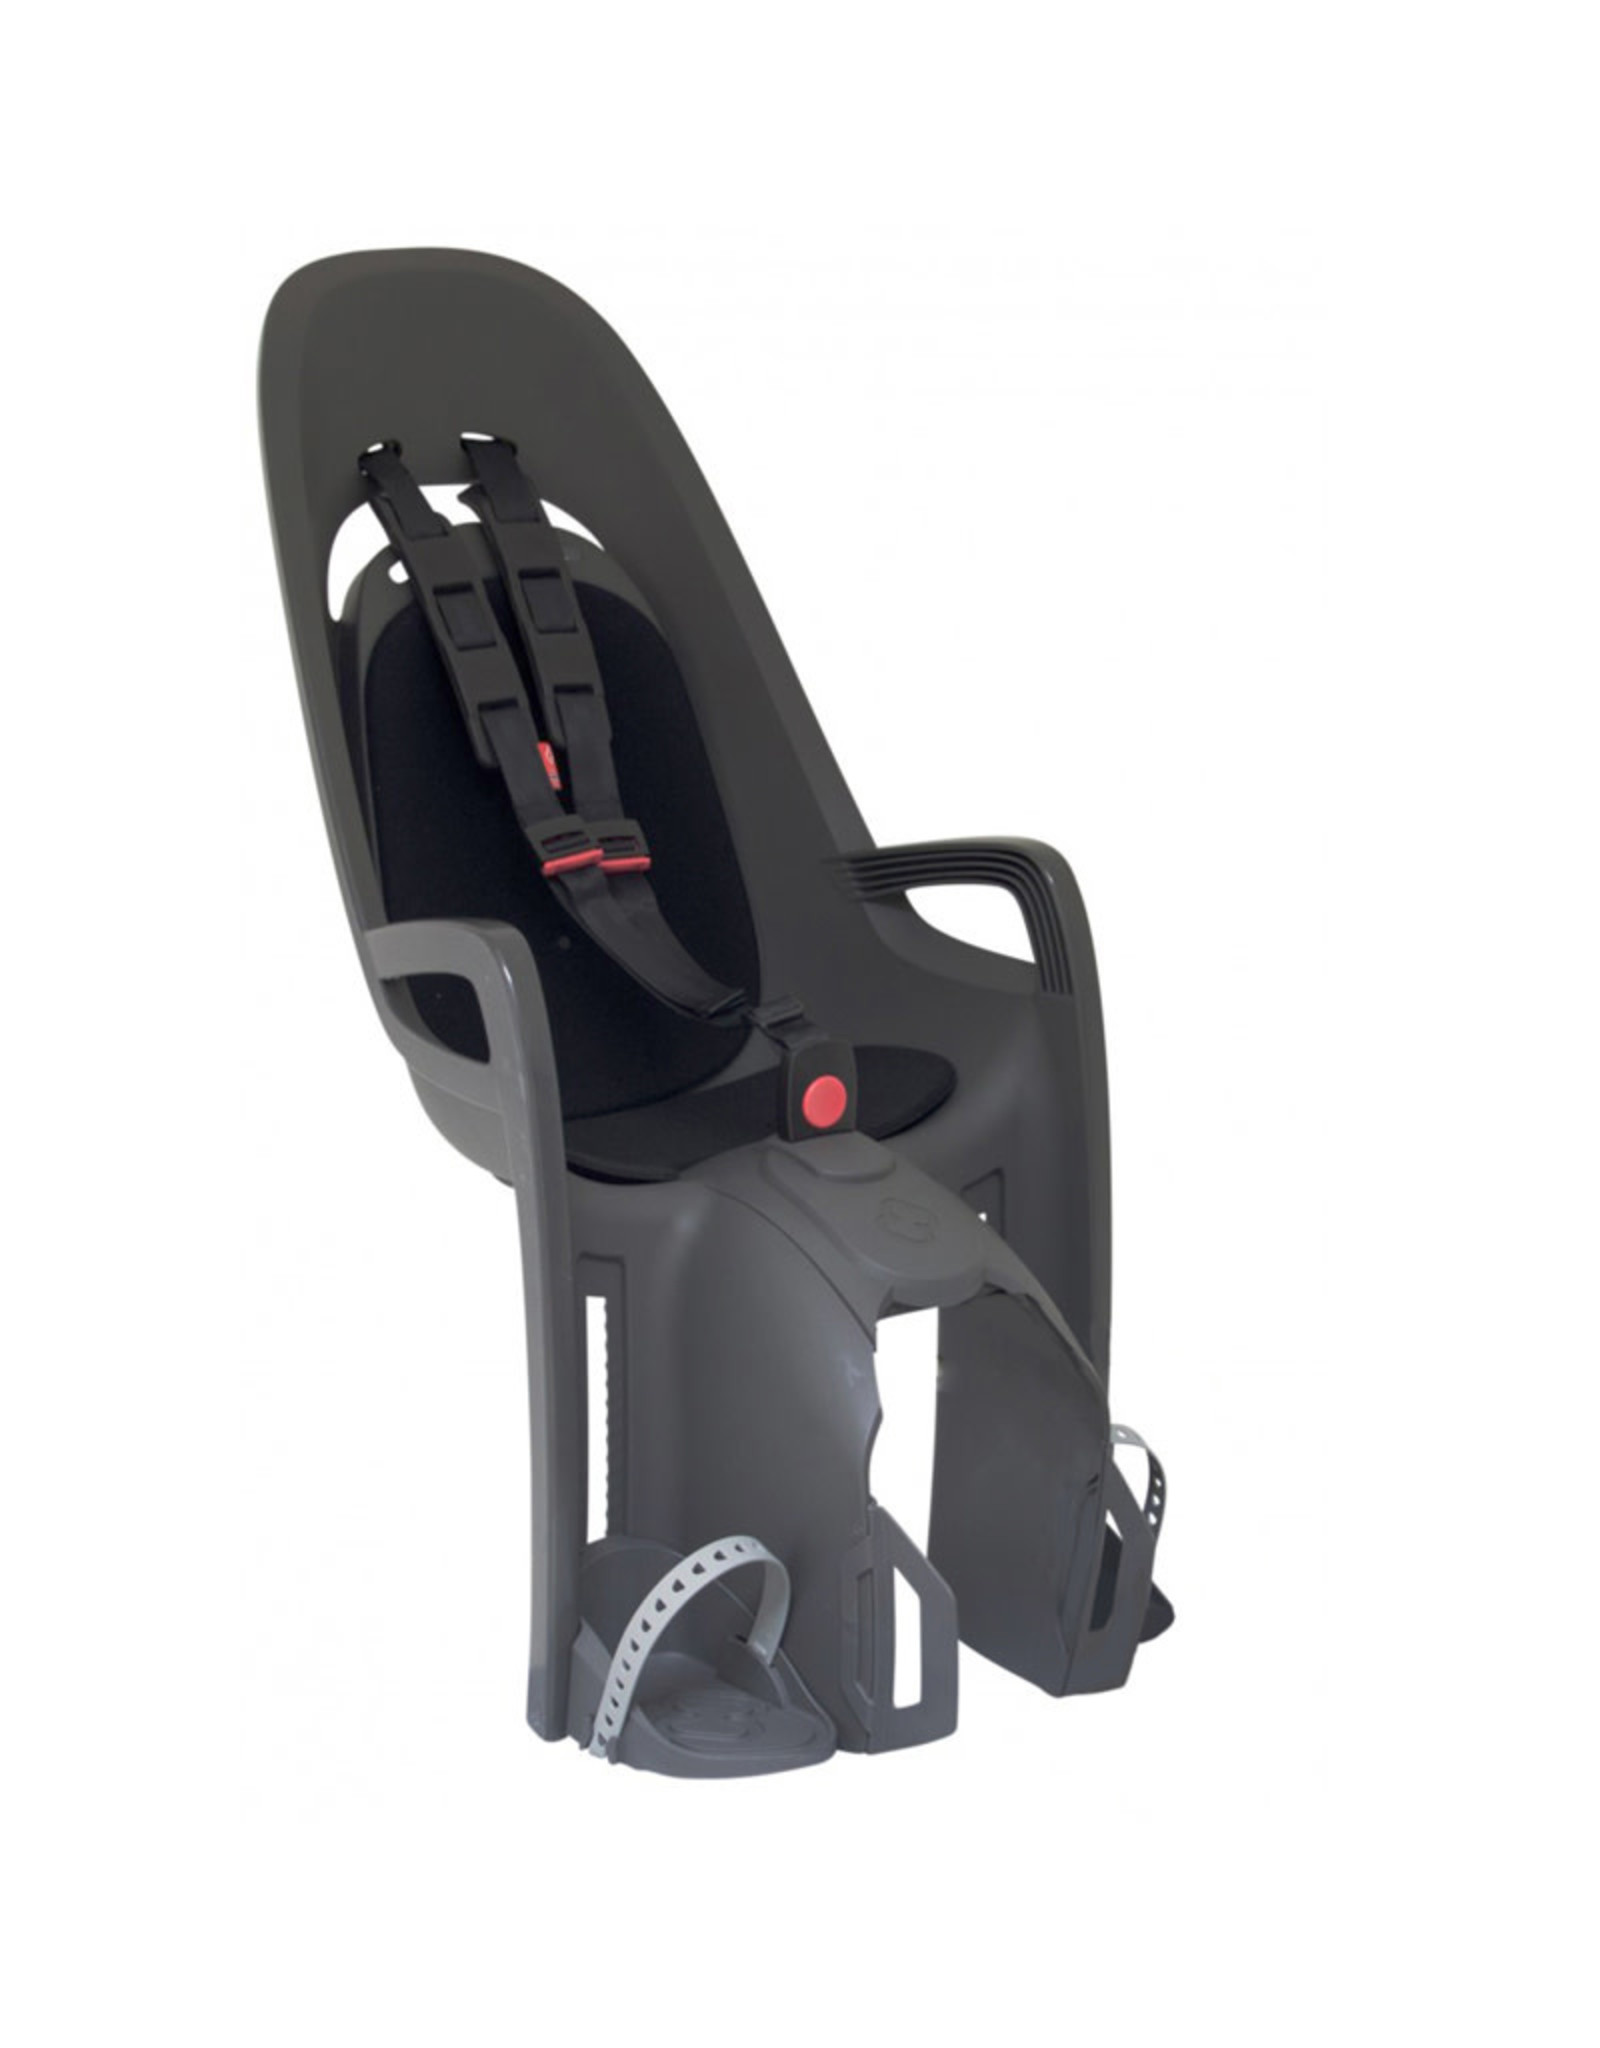 HAMAX ZENITH Baby Seat